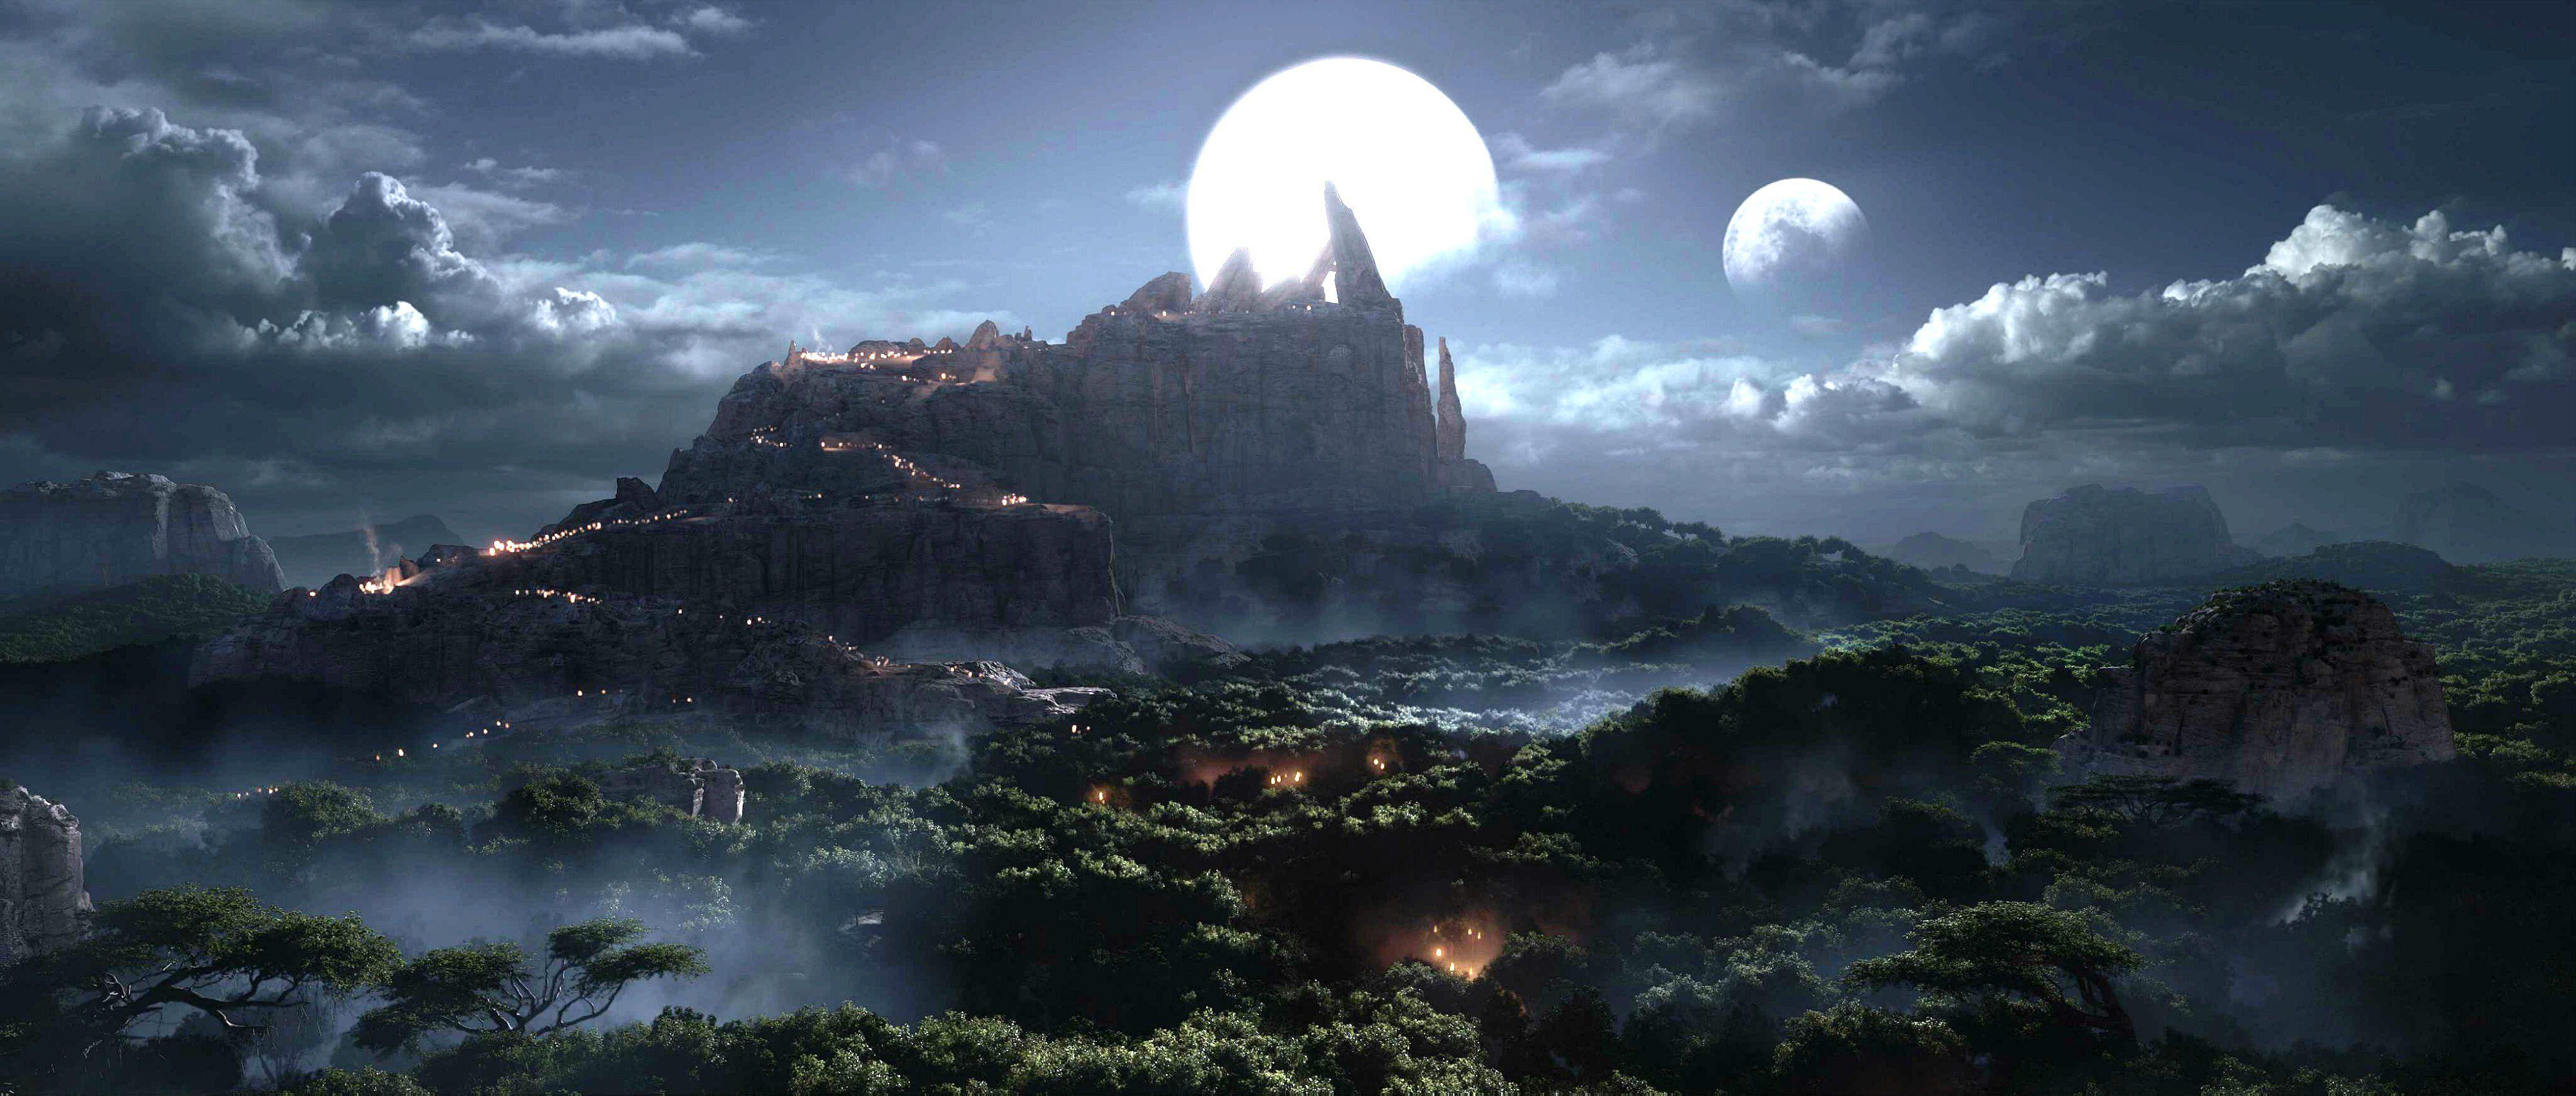 World Of Warcraft Landscape 4000x1702 Wallpaper Teahub Io